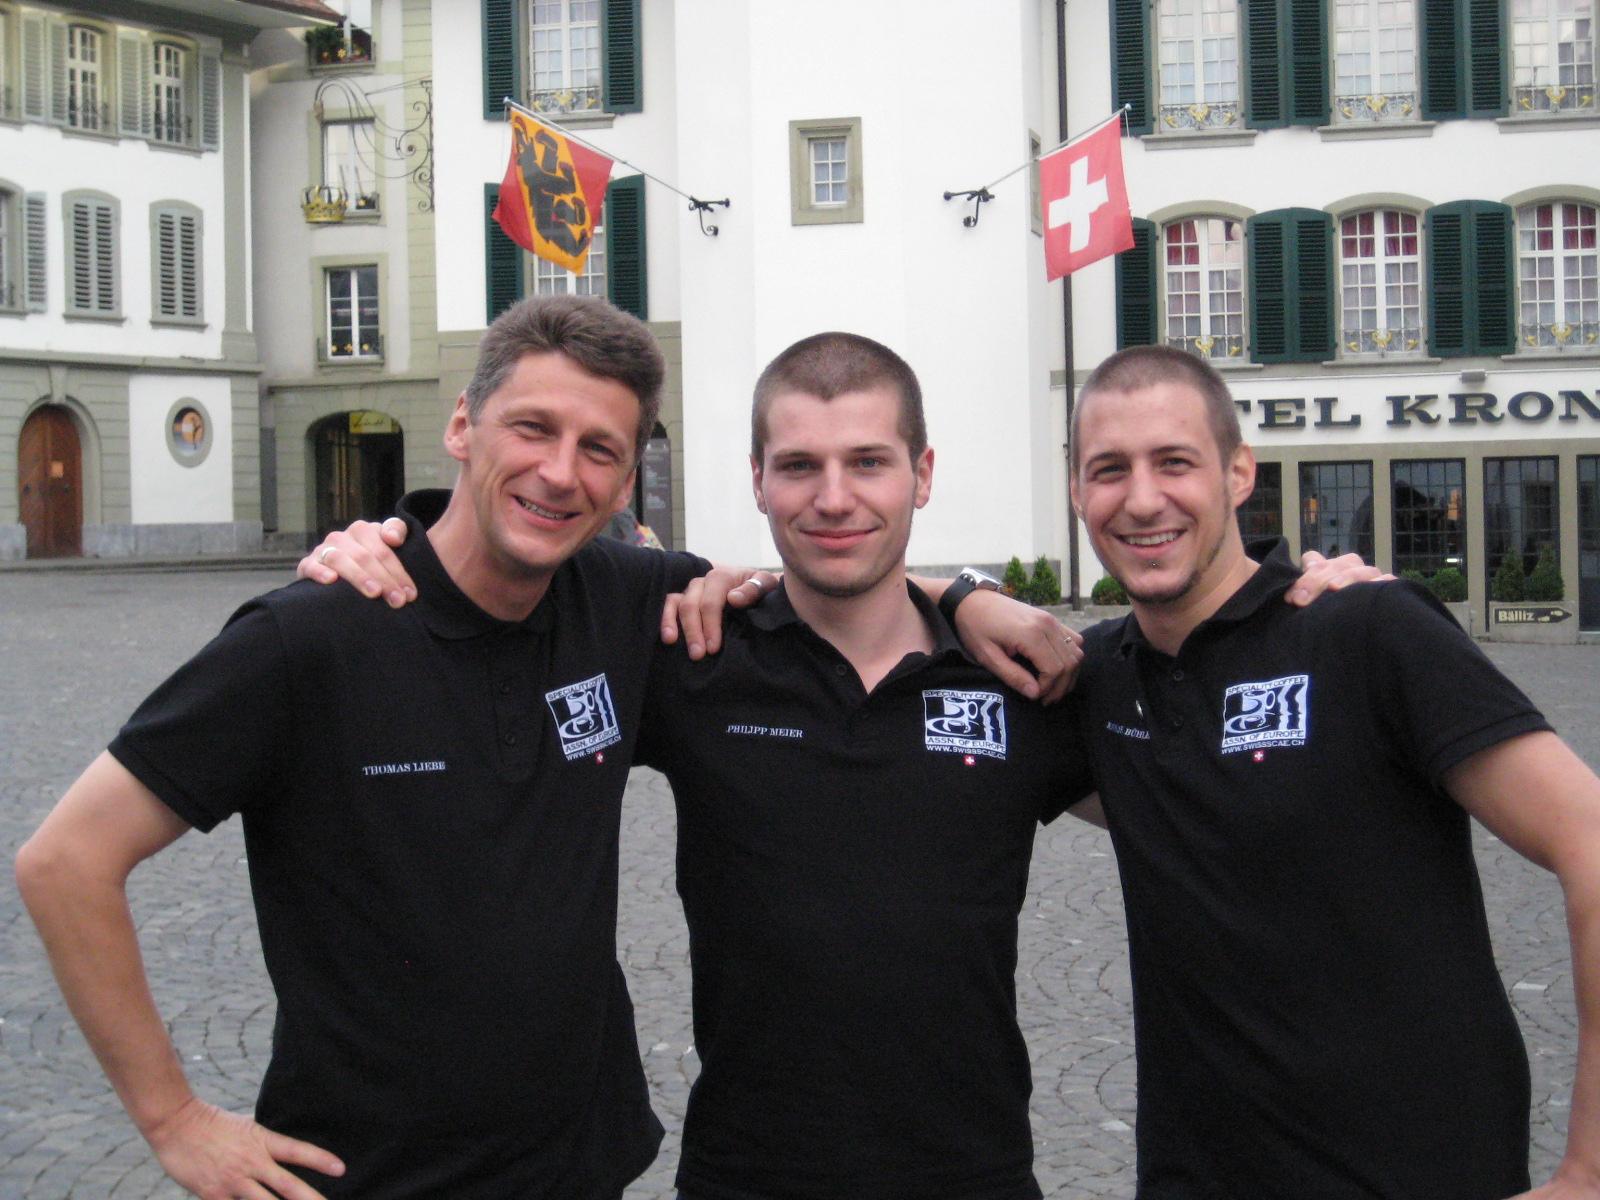 Thomas Liebe, Philipp Meier und Mathias Bühler